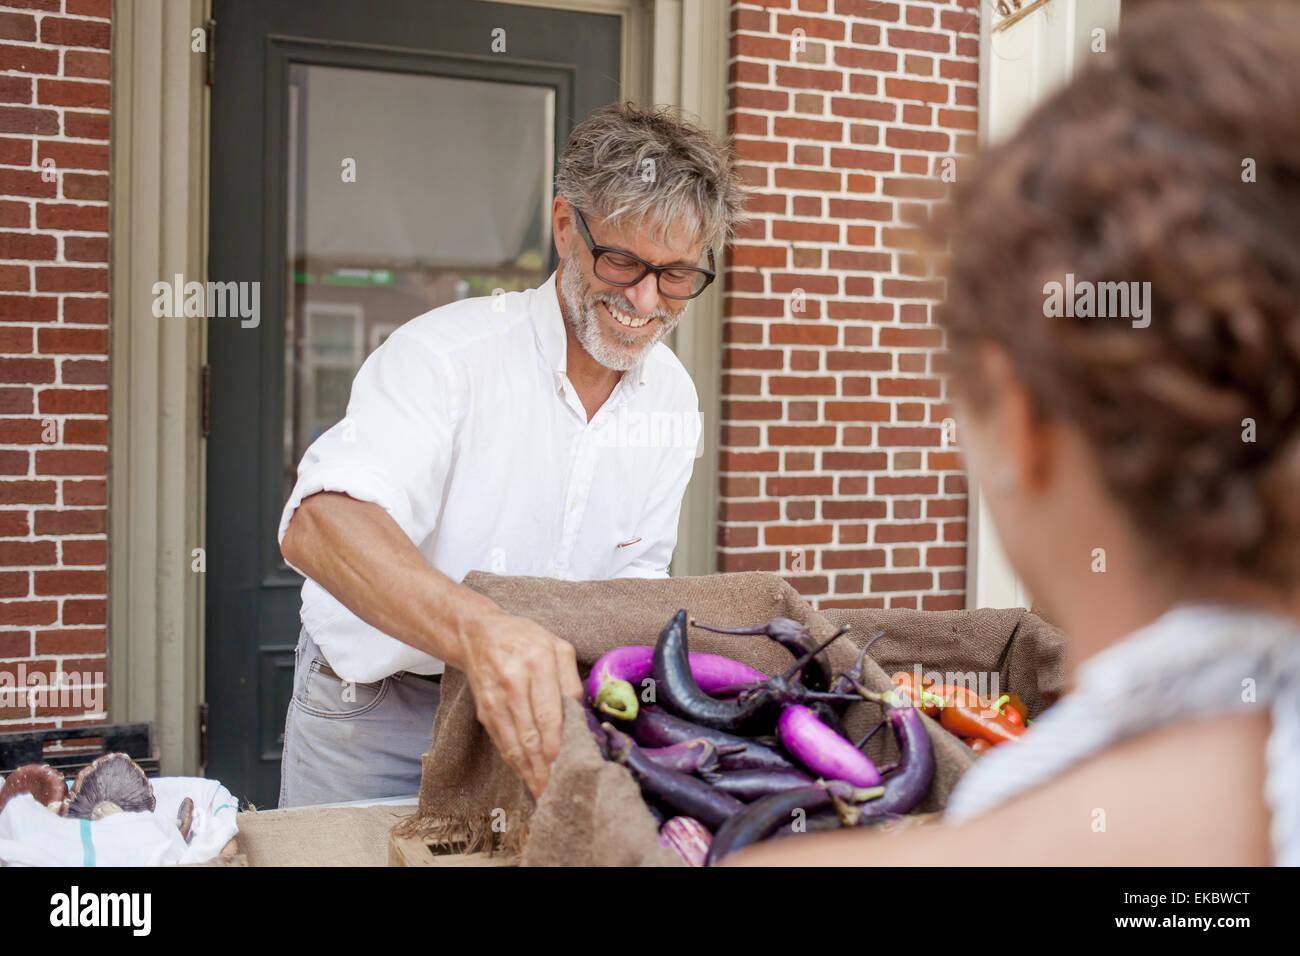 Farmer selling organic aubergines on stall - Stock Image